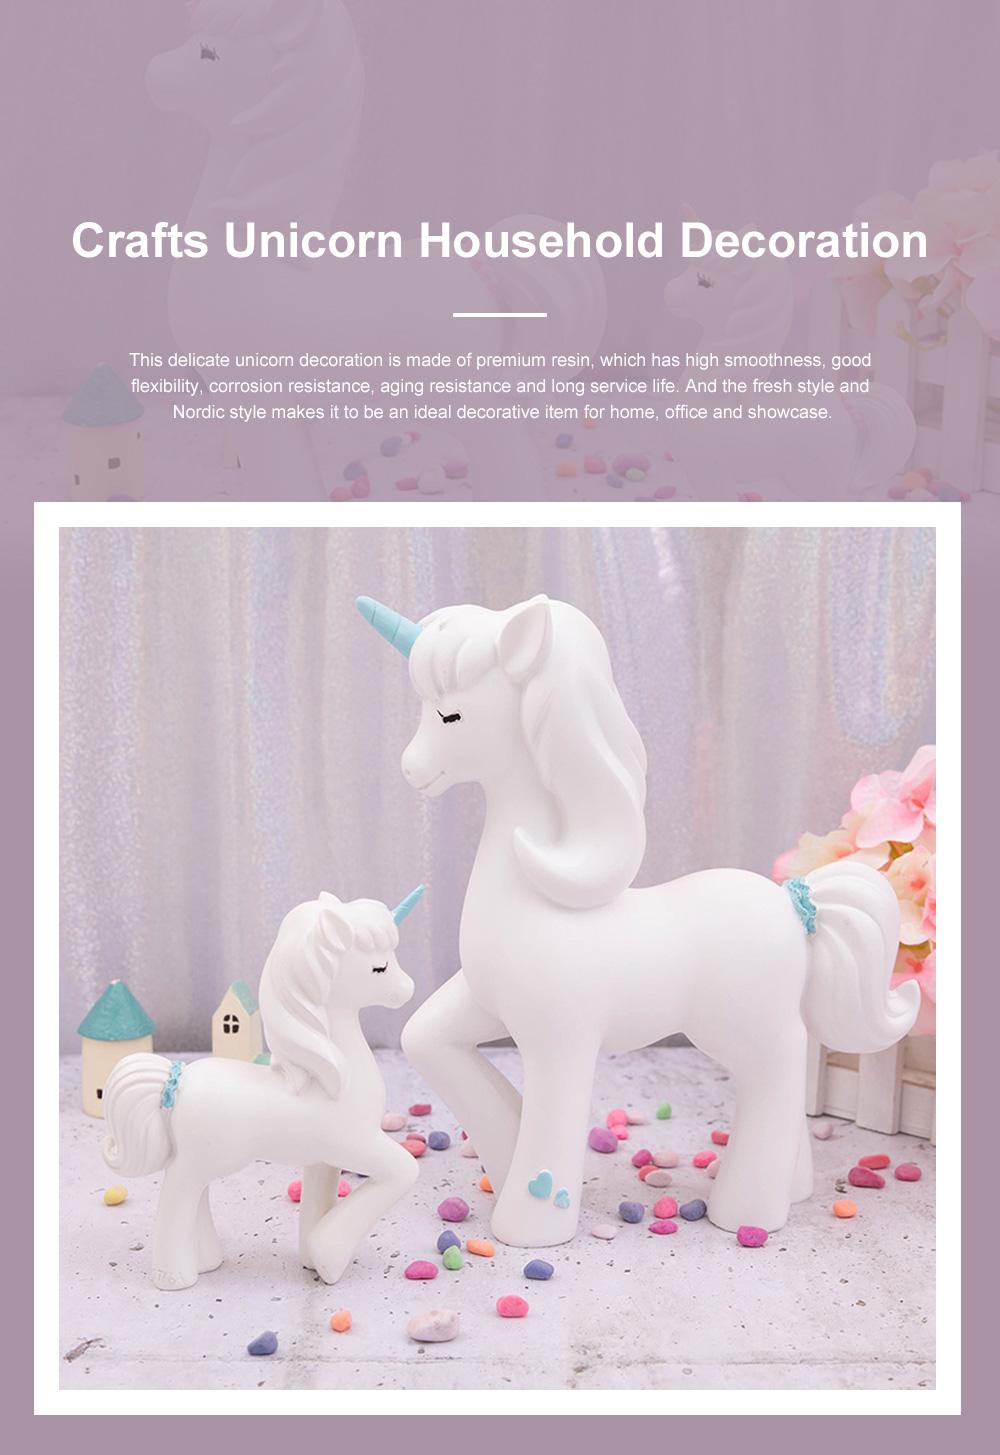 Crafts Unicorn Decoration Delicate Household Decorative Resin Unicorn for Living Room Bedroom Showcase 0